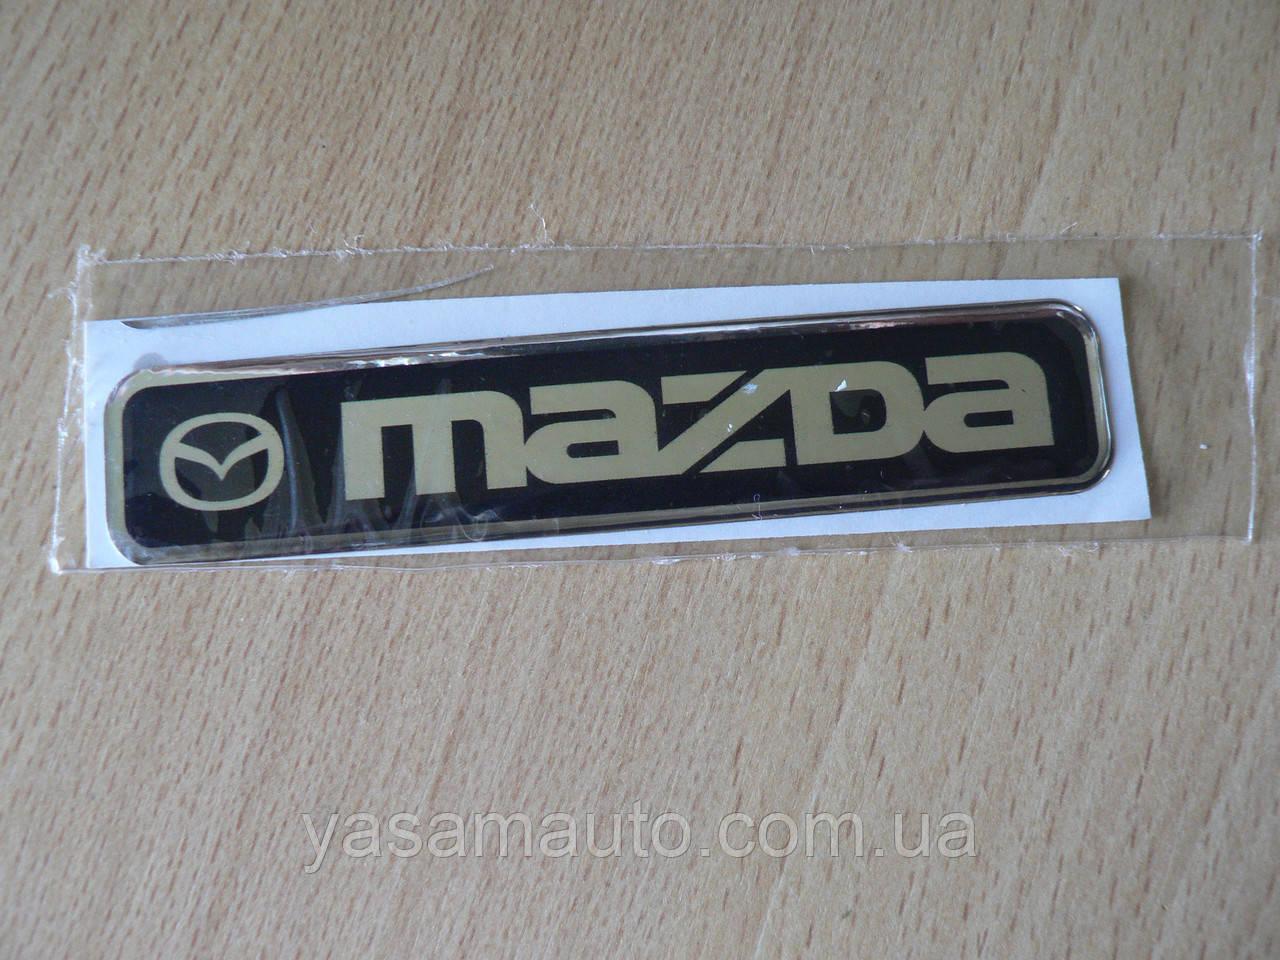 Наклейка s надпись MAZDA 100х20х1мм силиконовая на авто эмблема логотип Мазда